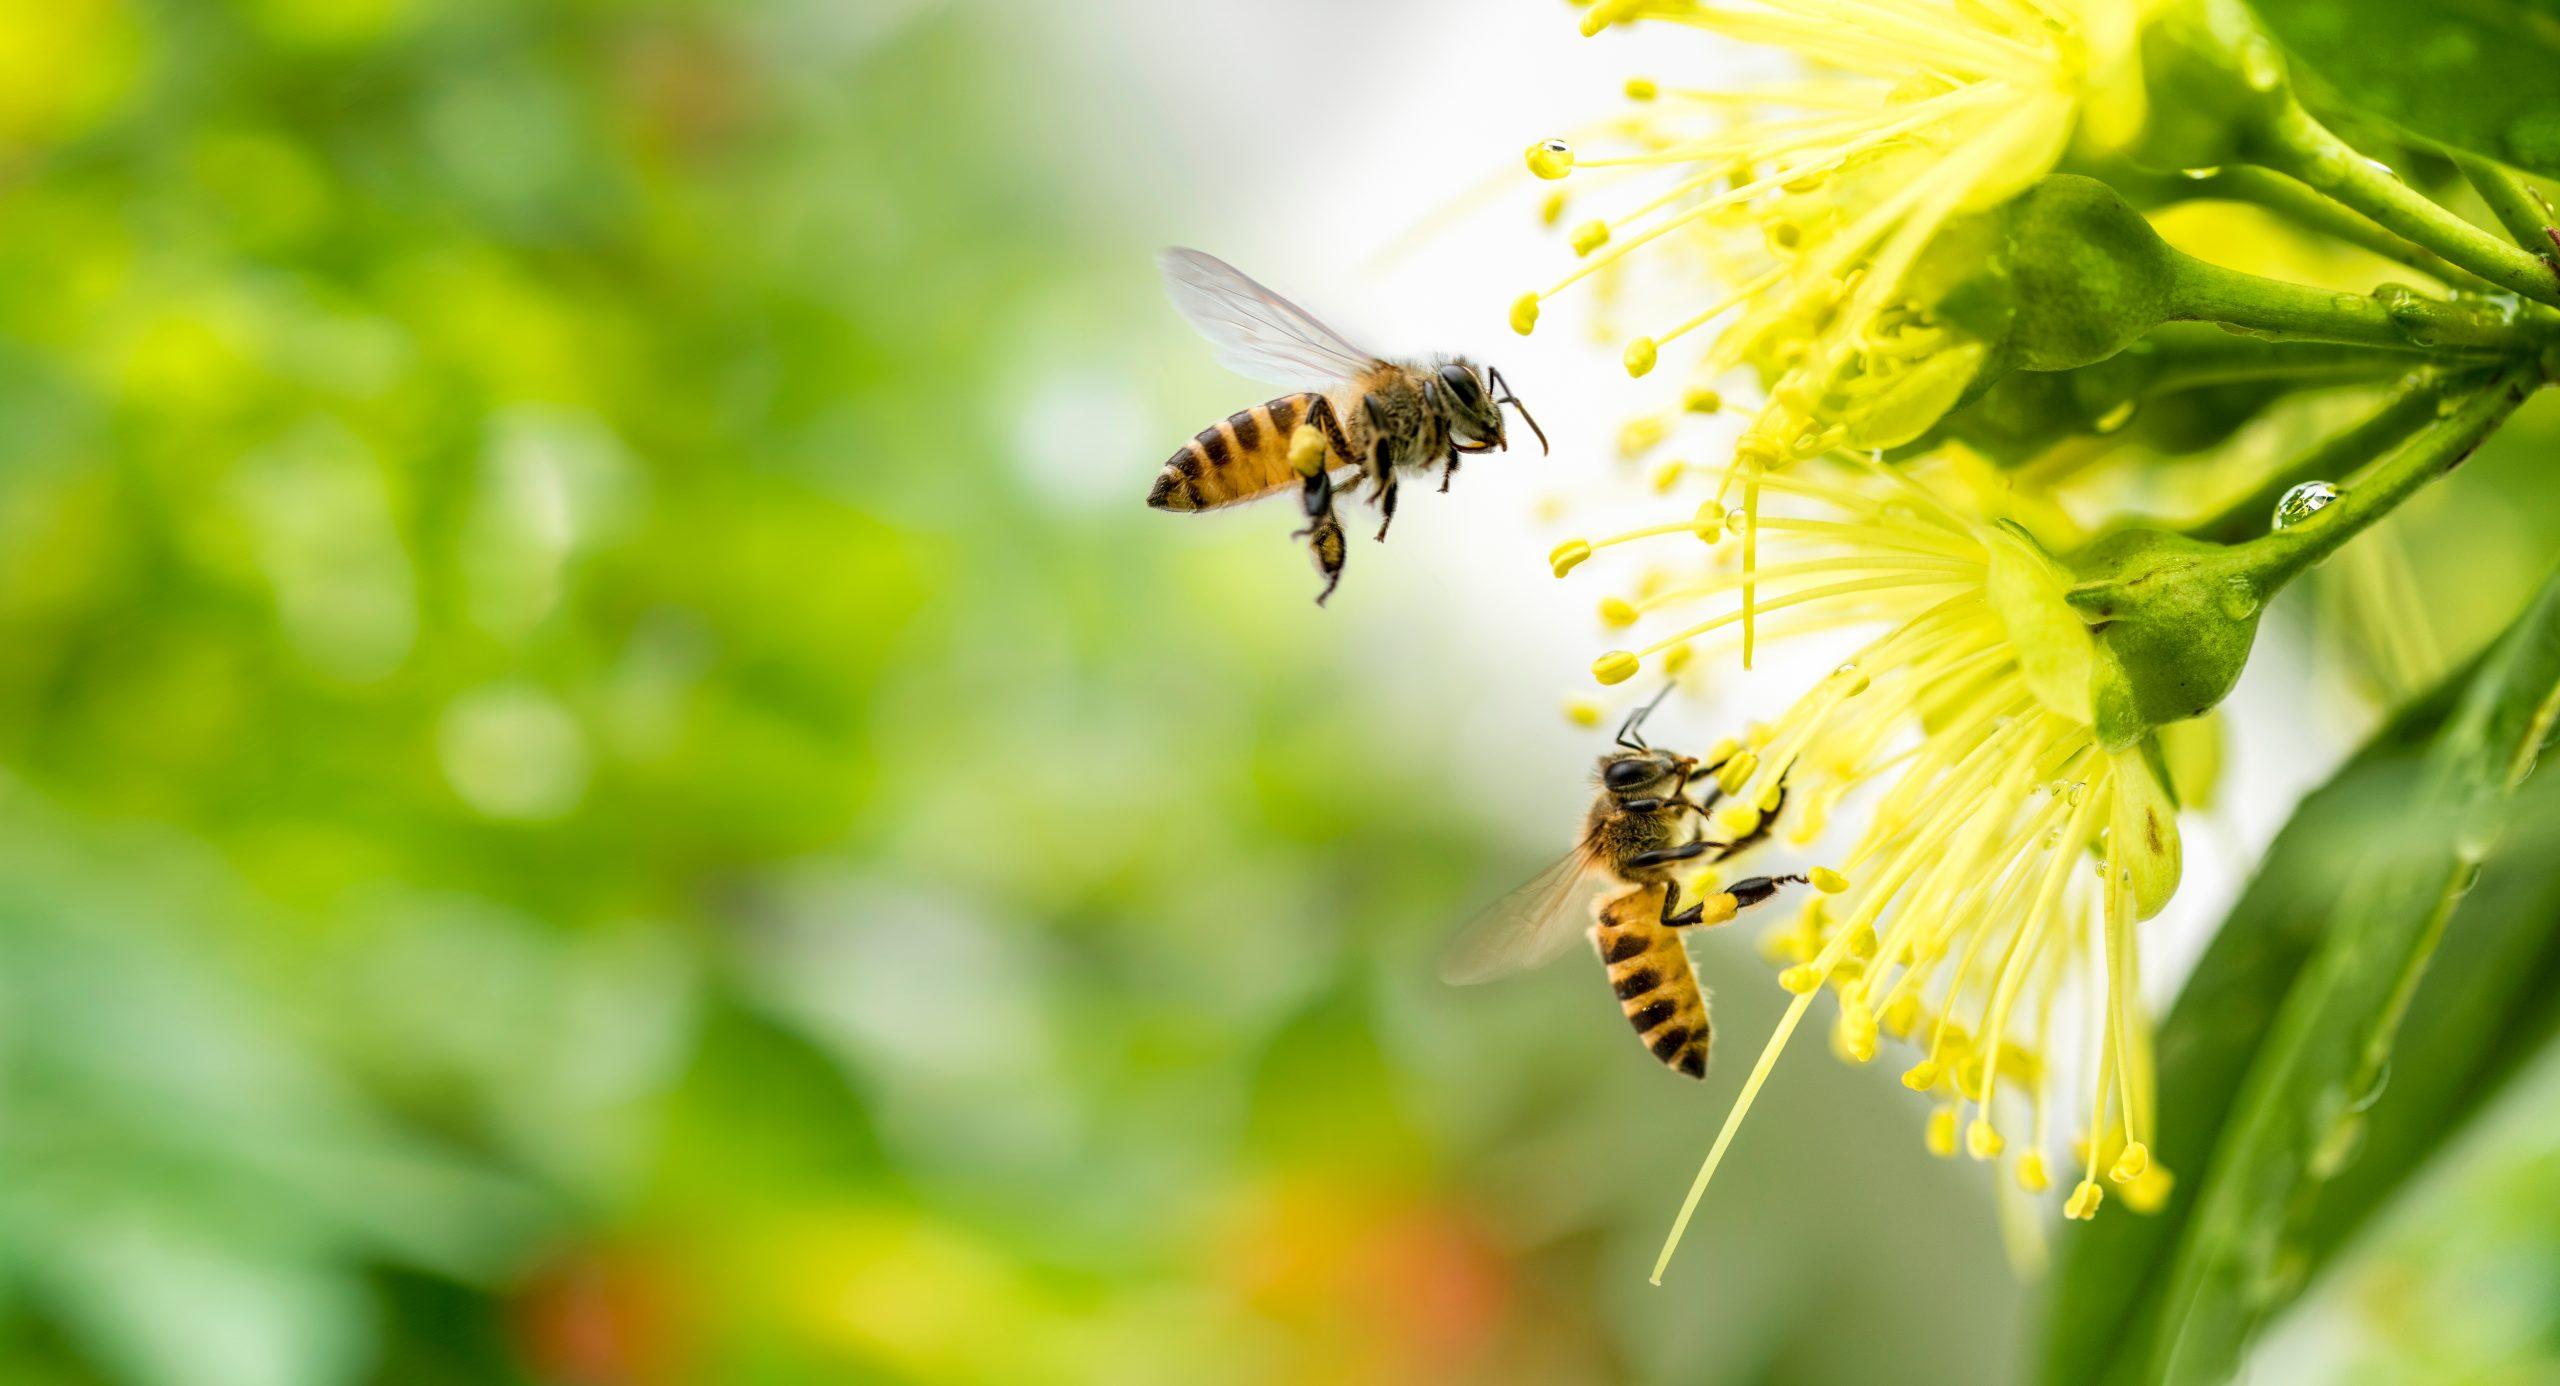 flying honey bee collecting pollen yellow